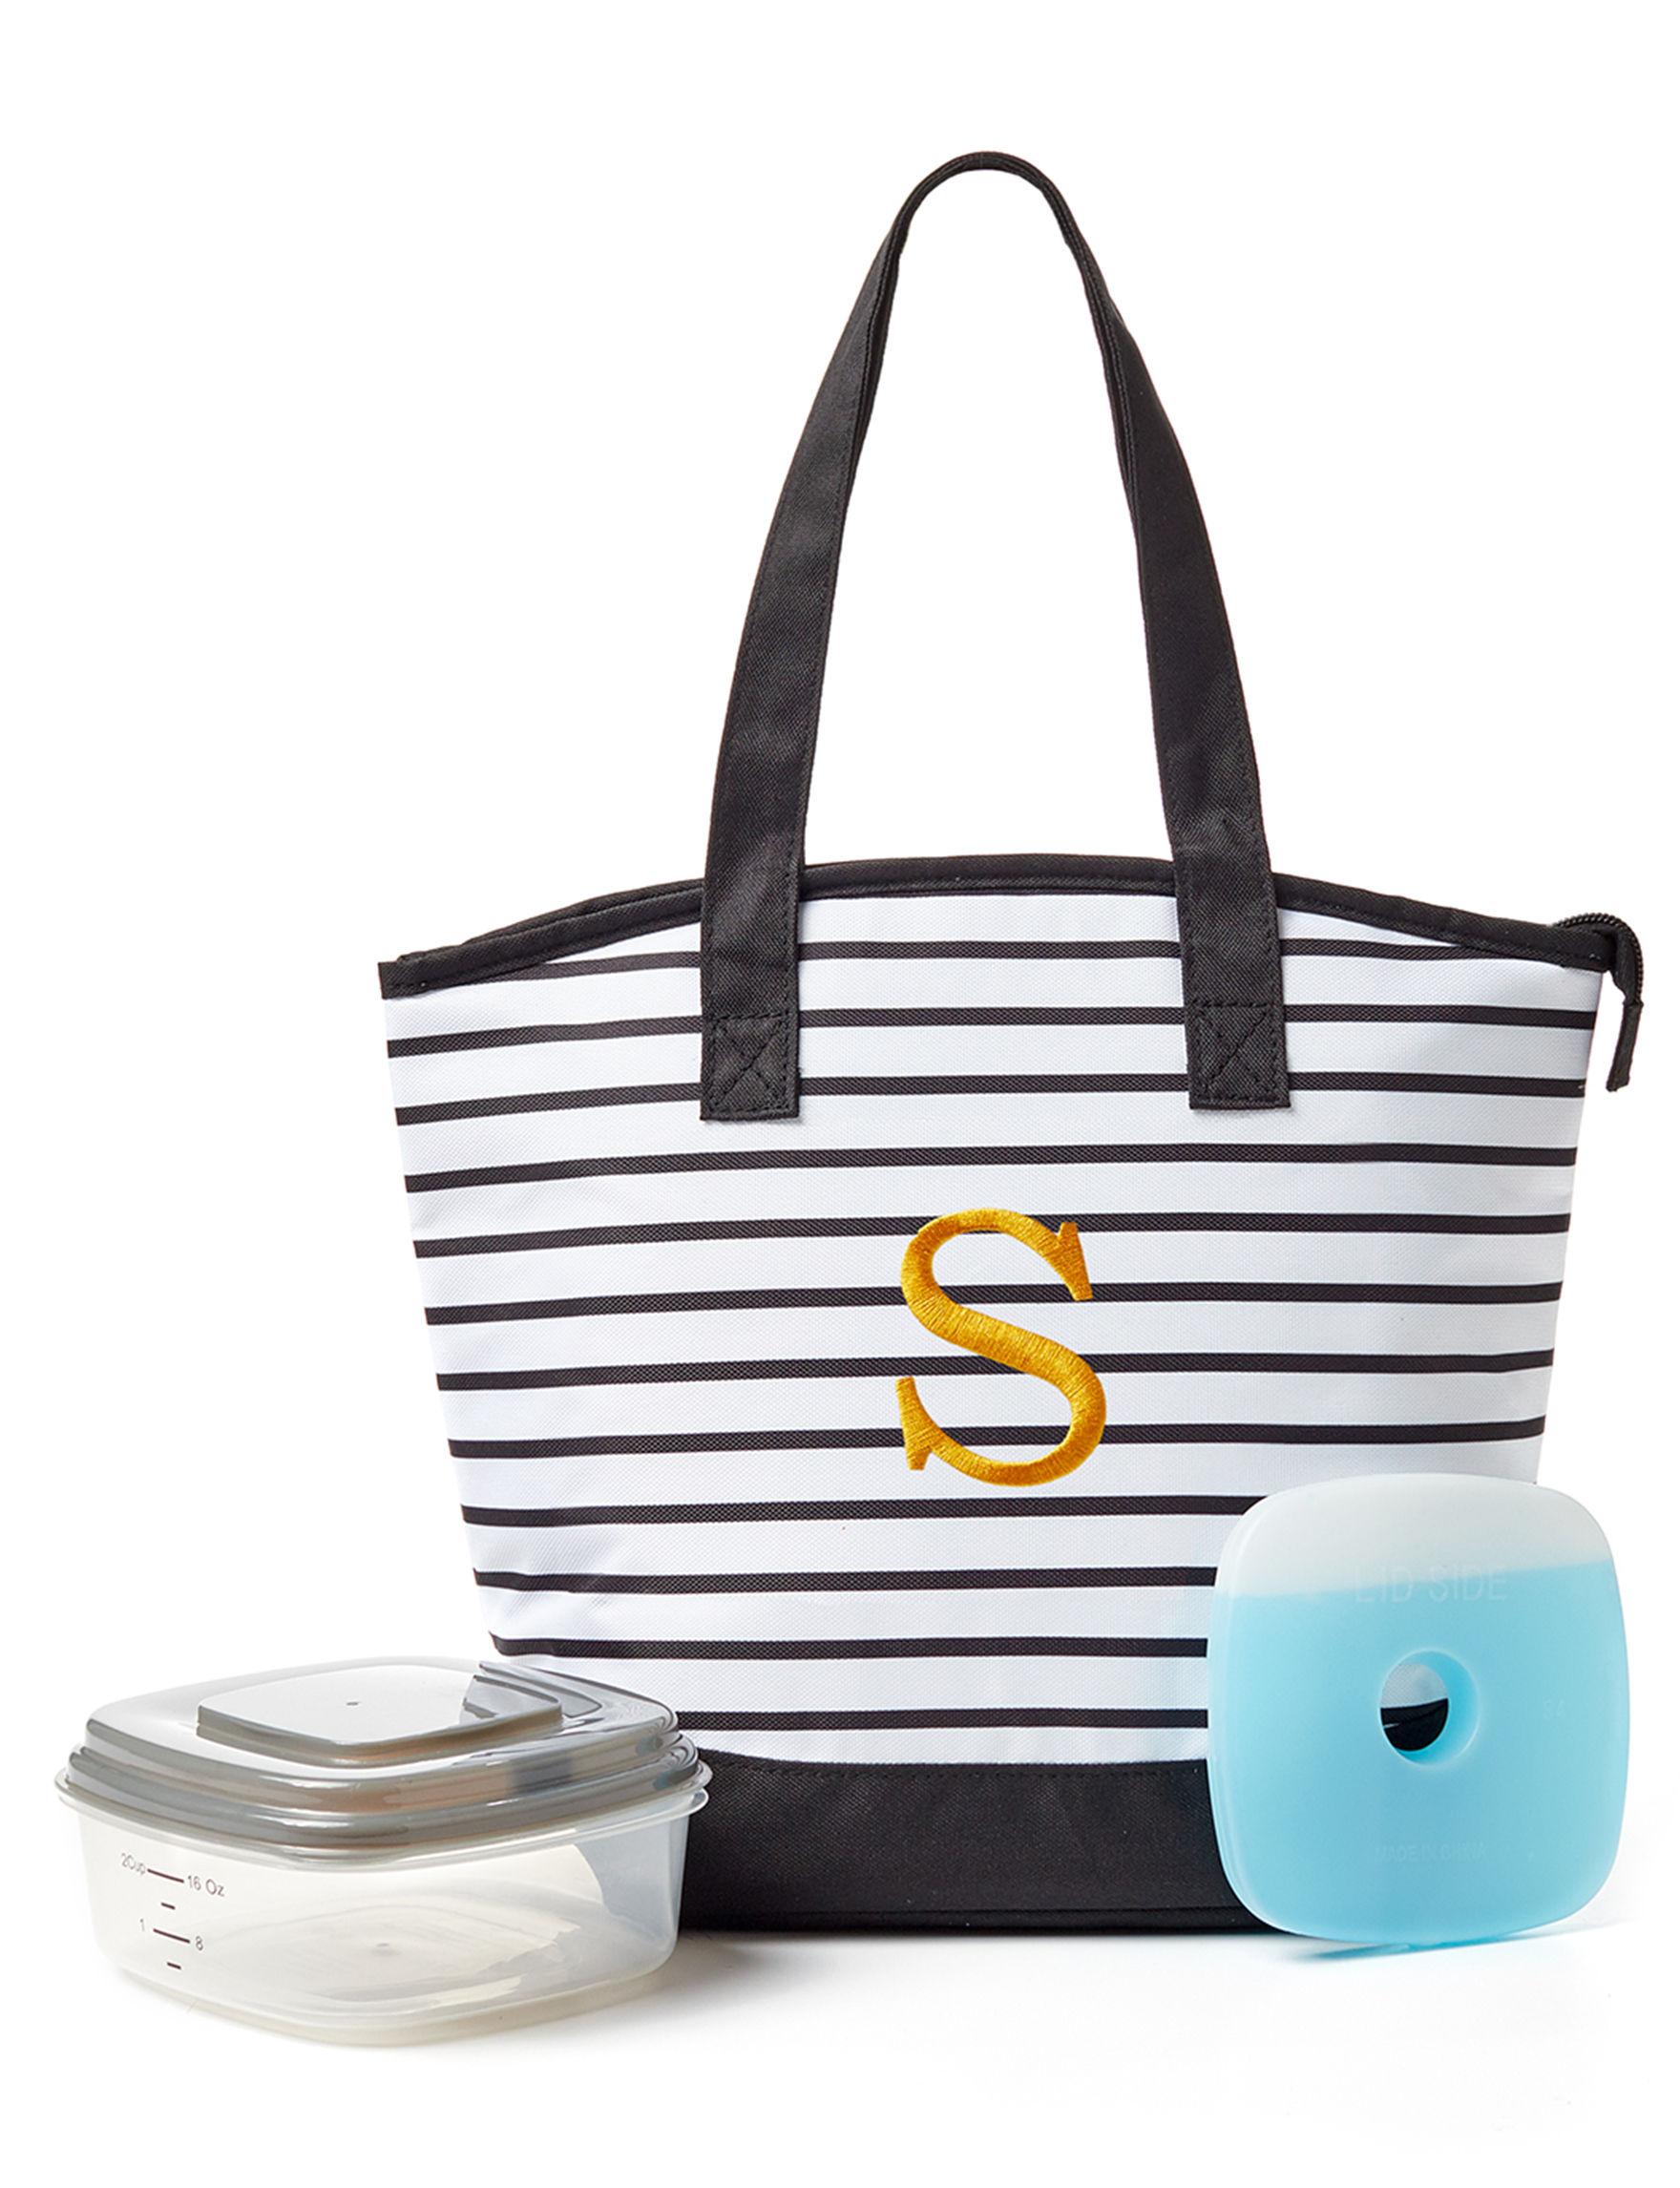 Fit & Fresh White / Black Lunch Boxes & Bags Kitchen Storage & Organization